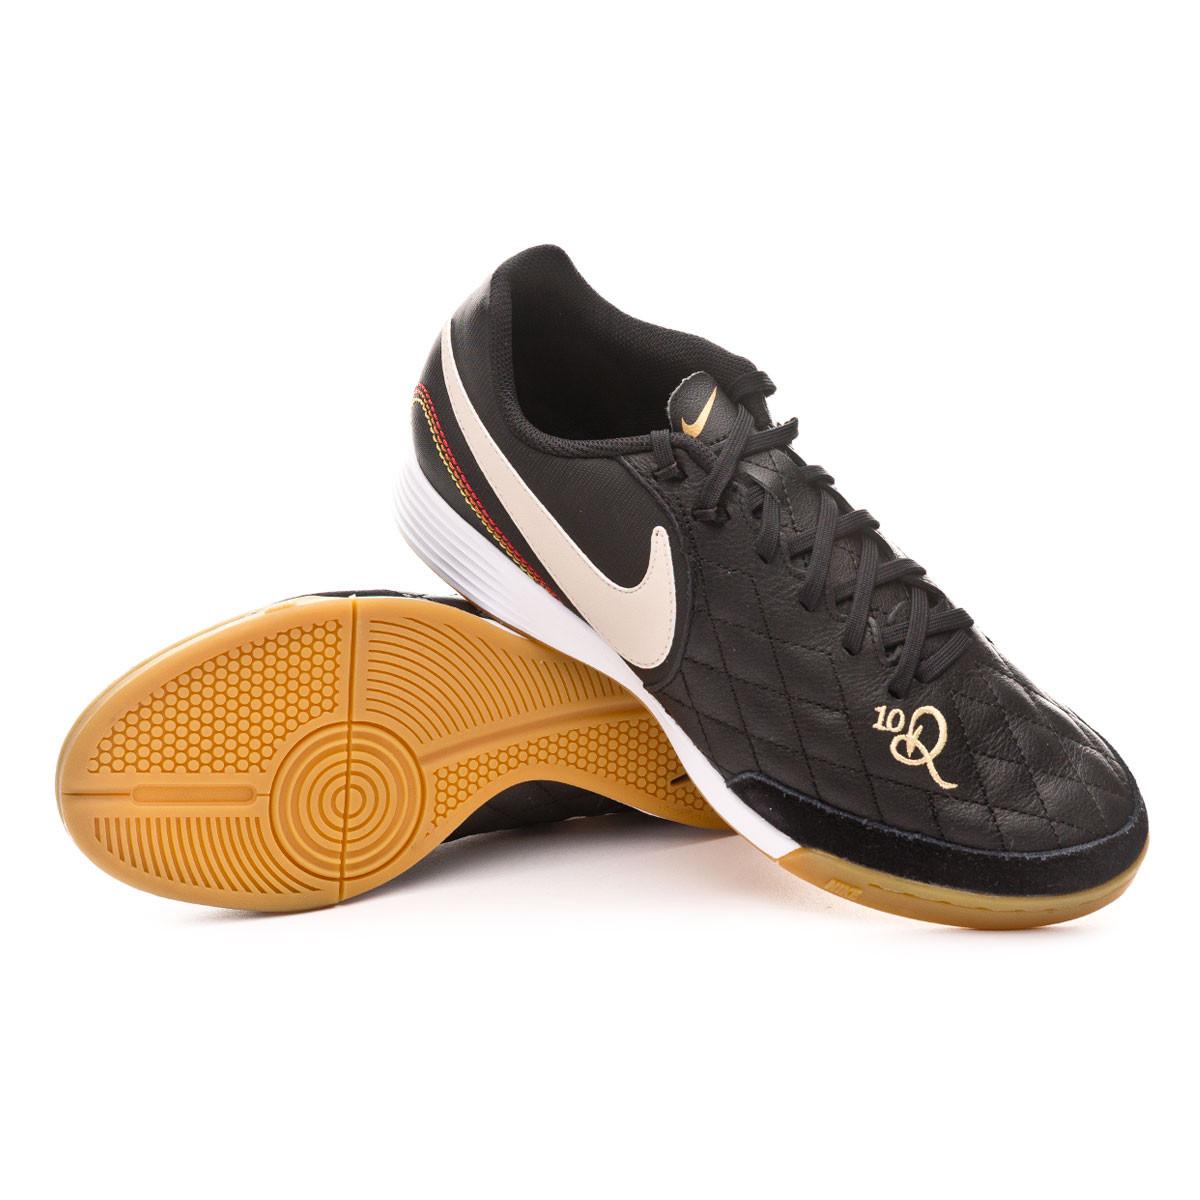 Hecho un desastre Arriba Cocinando  Futsal Boot Nike Tiempo LegendX VII Academy 10R IC Black-Light  orewood-Metallic gold - Football store Fútbol Emotion